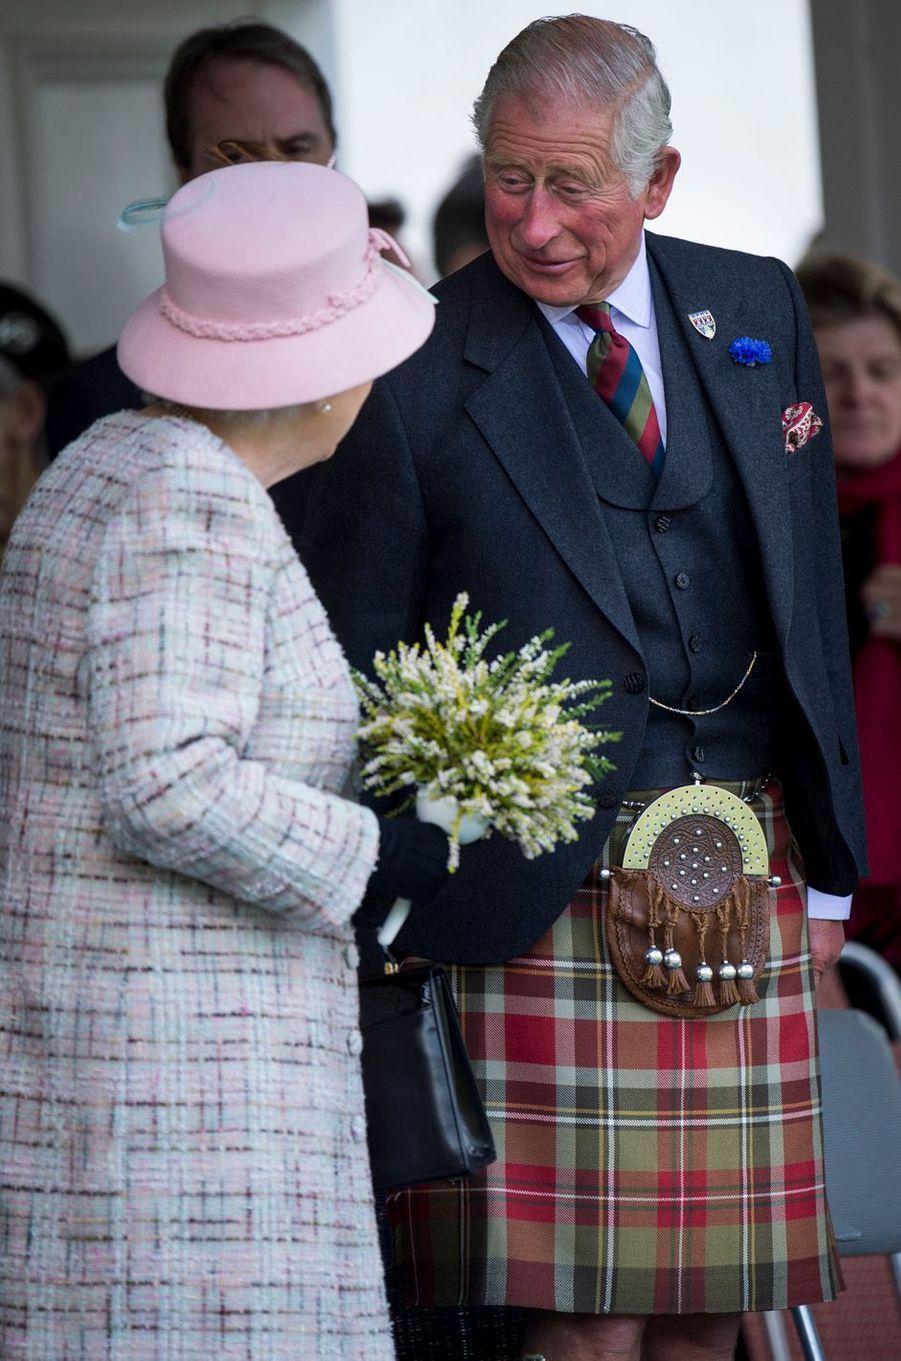 La reine Elizabeth II et le prince Charles au Highlands Braemar Gathering en Ecosse, le 2 septembre 2017